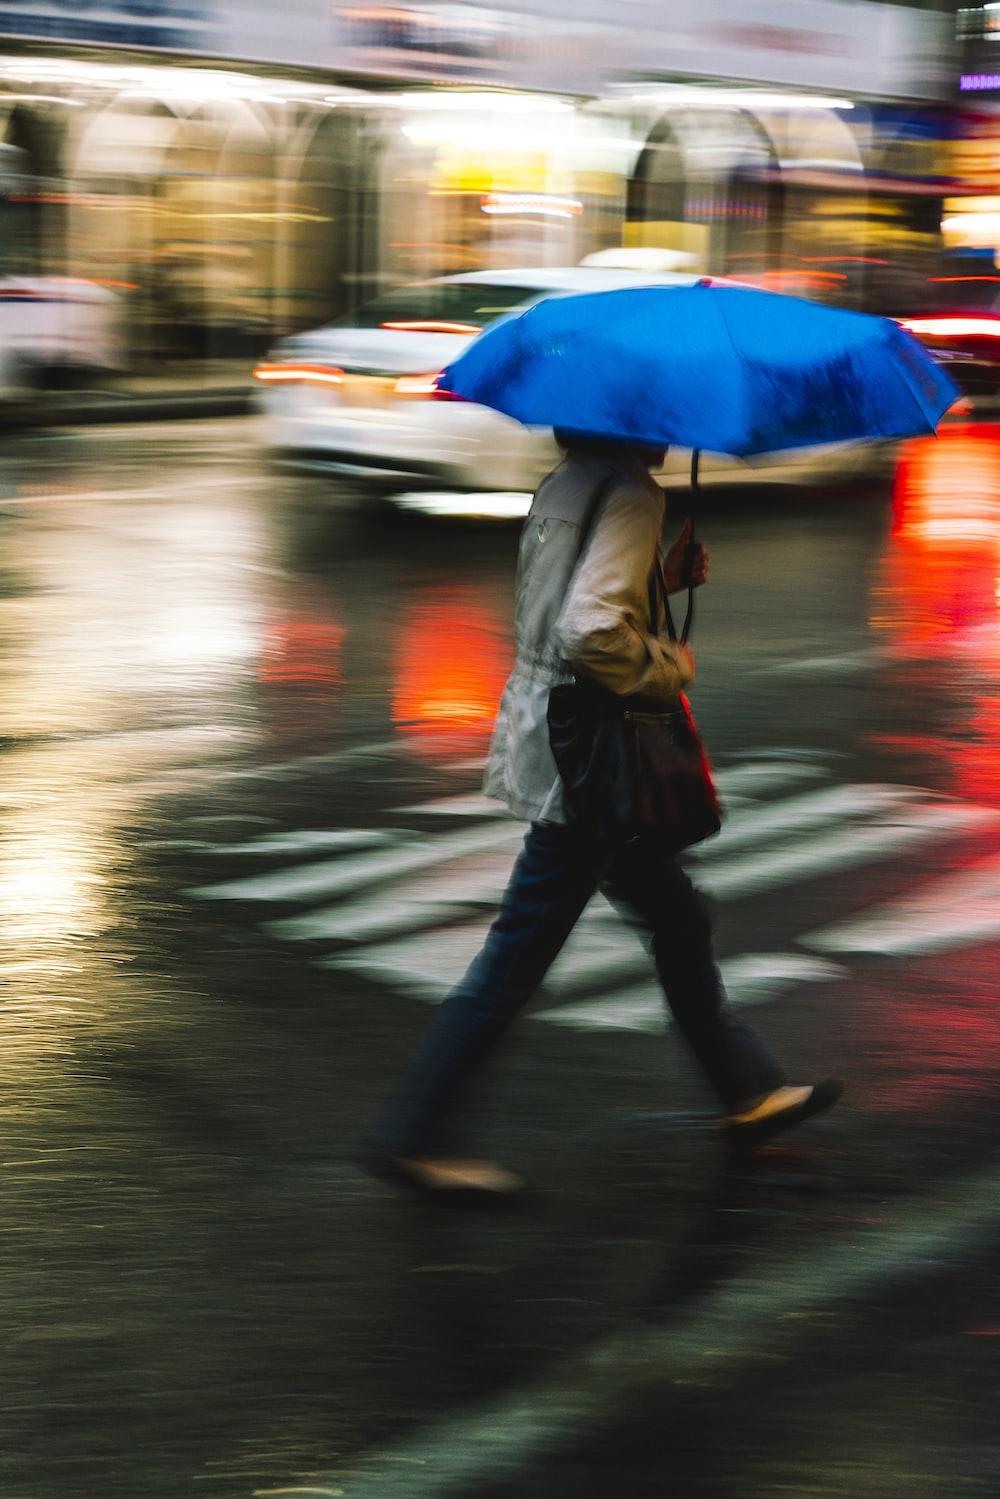 person walking on pedestrian lane while holding umbrella